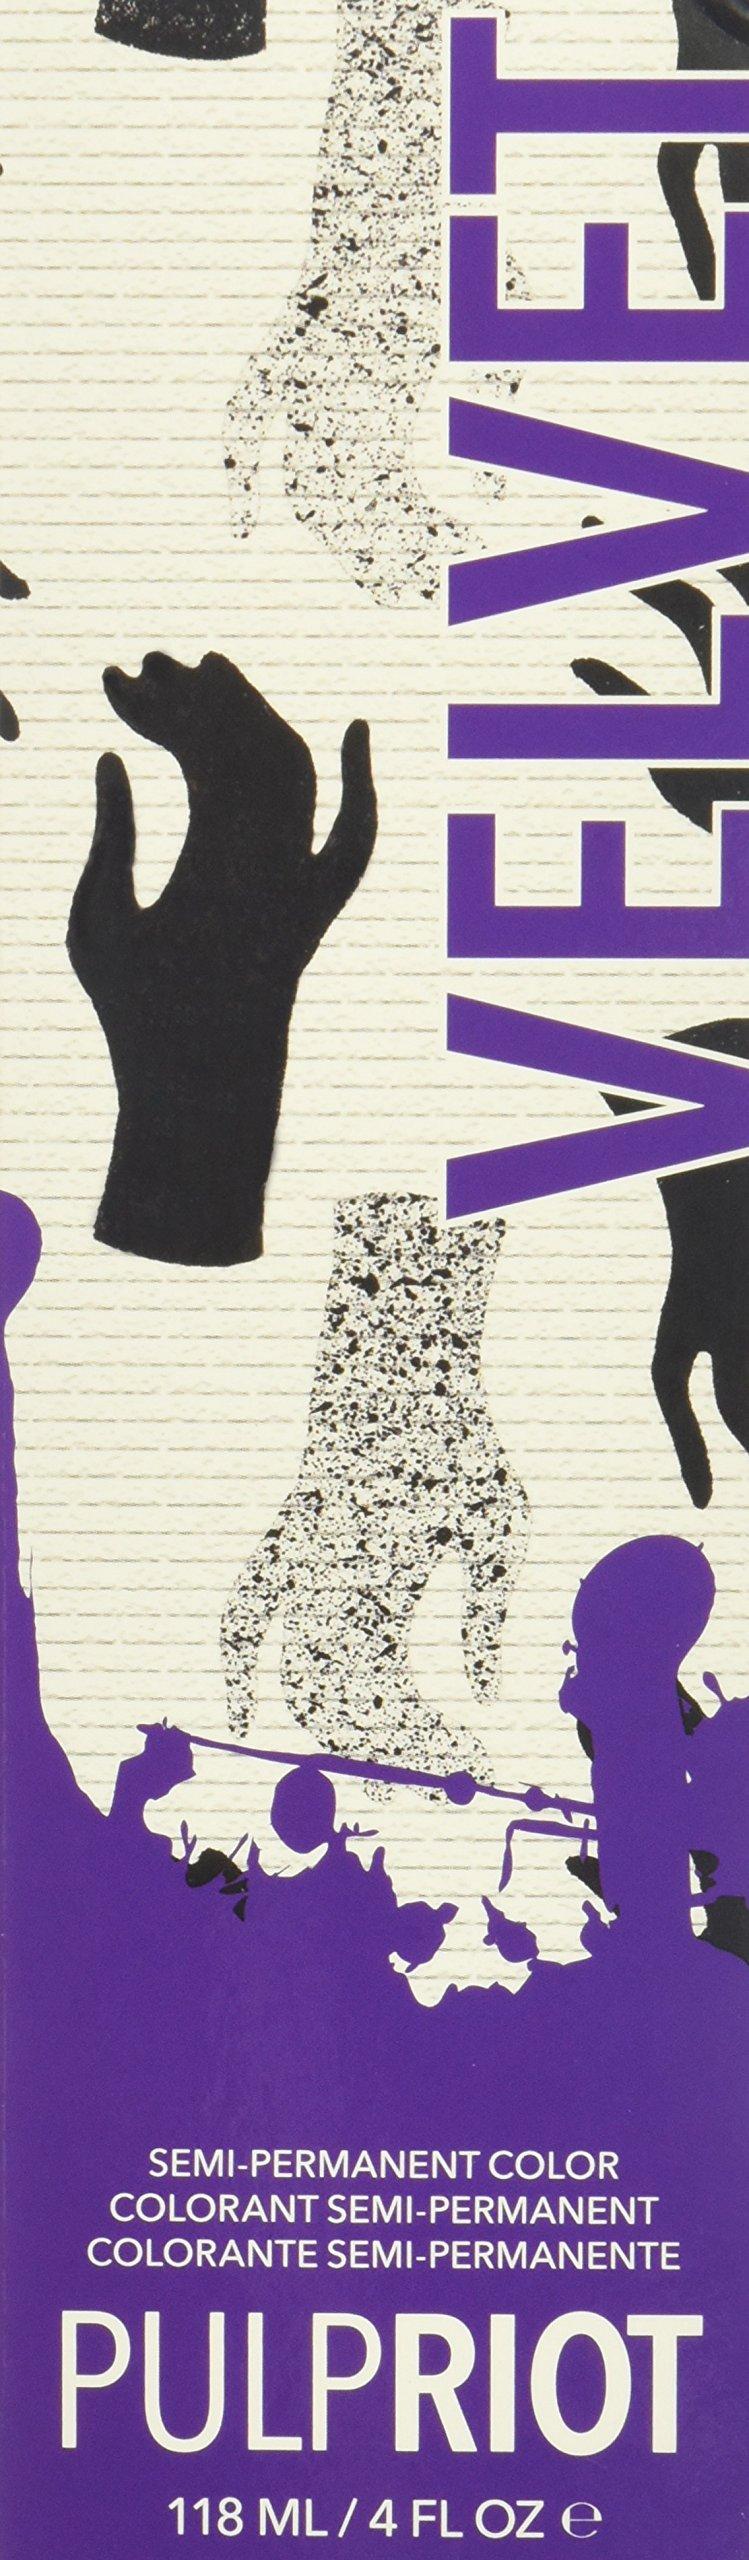 Pulp Riot Semi-Permanent Hair Color for Unisex, Velvet Eggplant, 4 Ounce by Pulp Riot (Image #3)